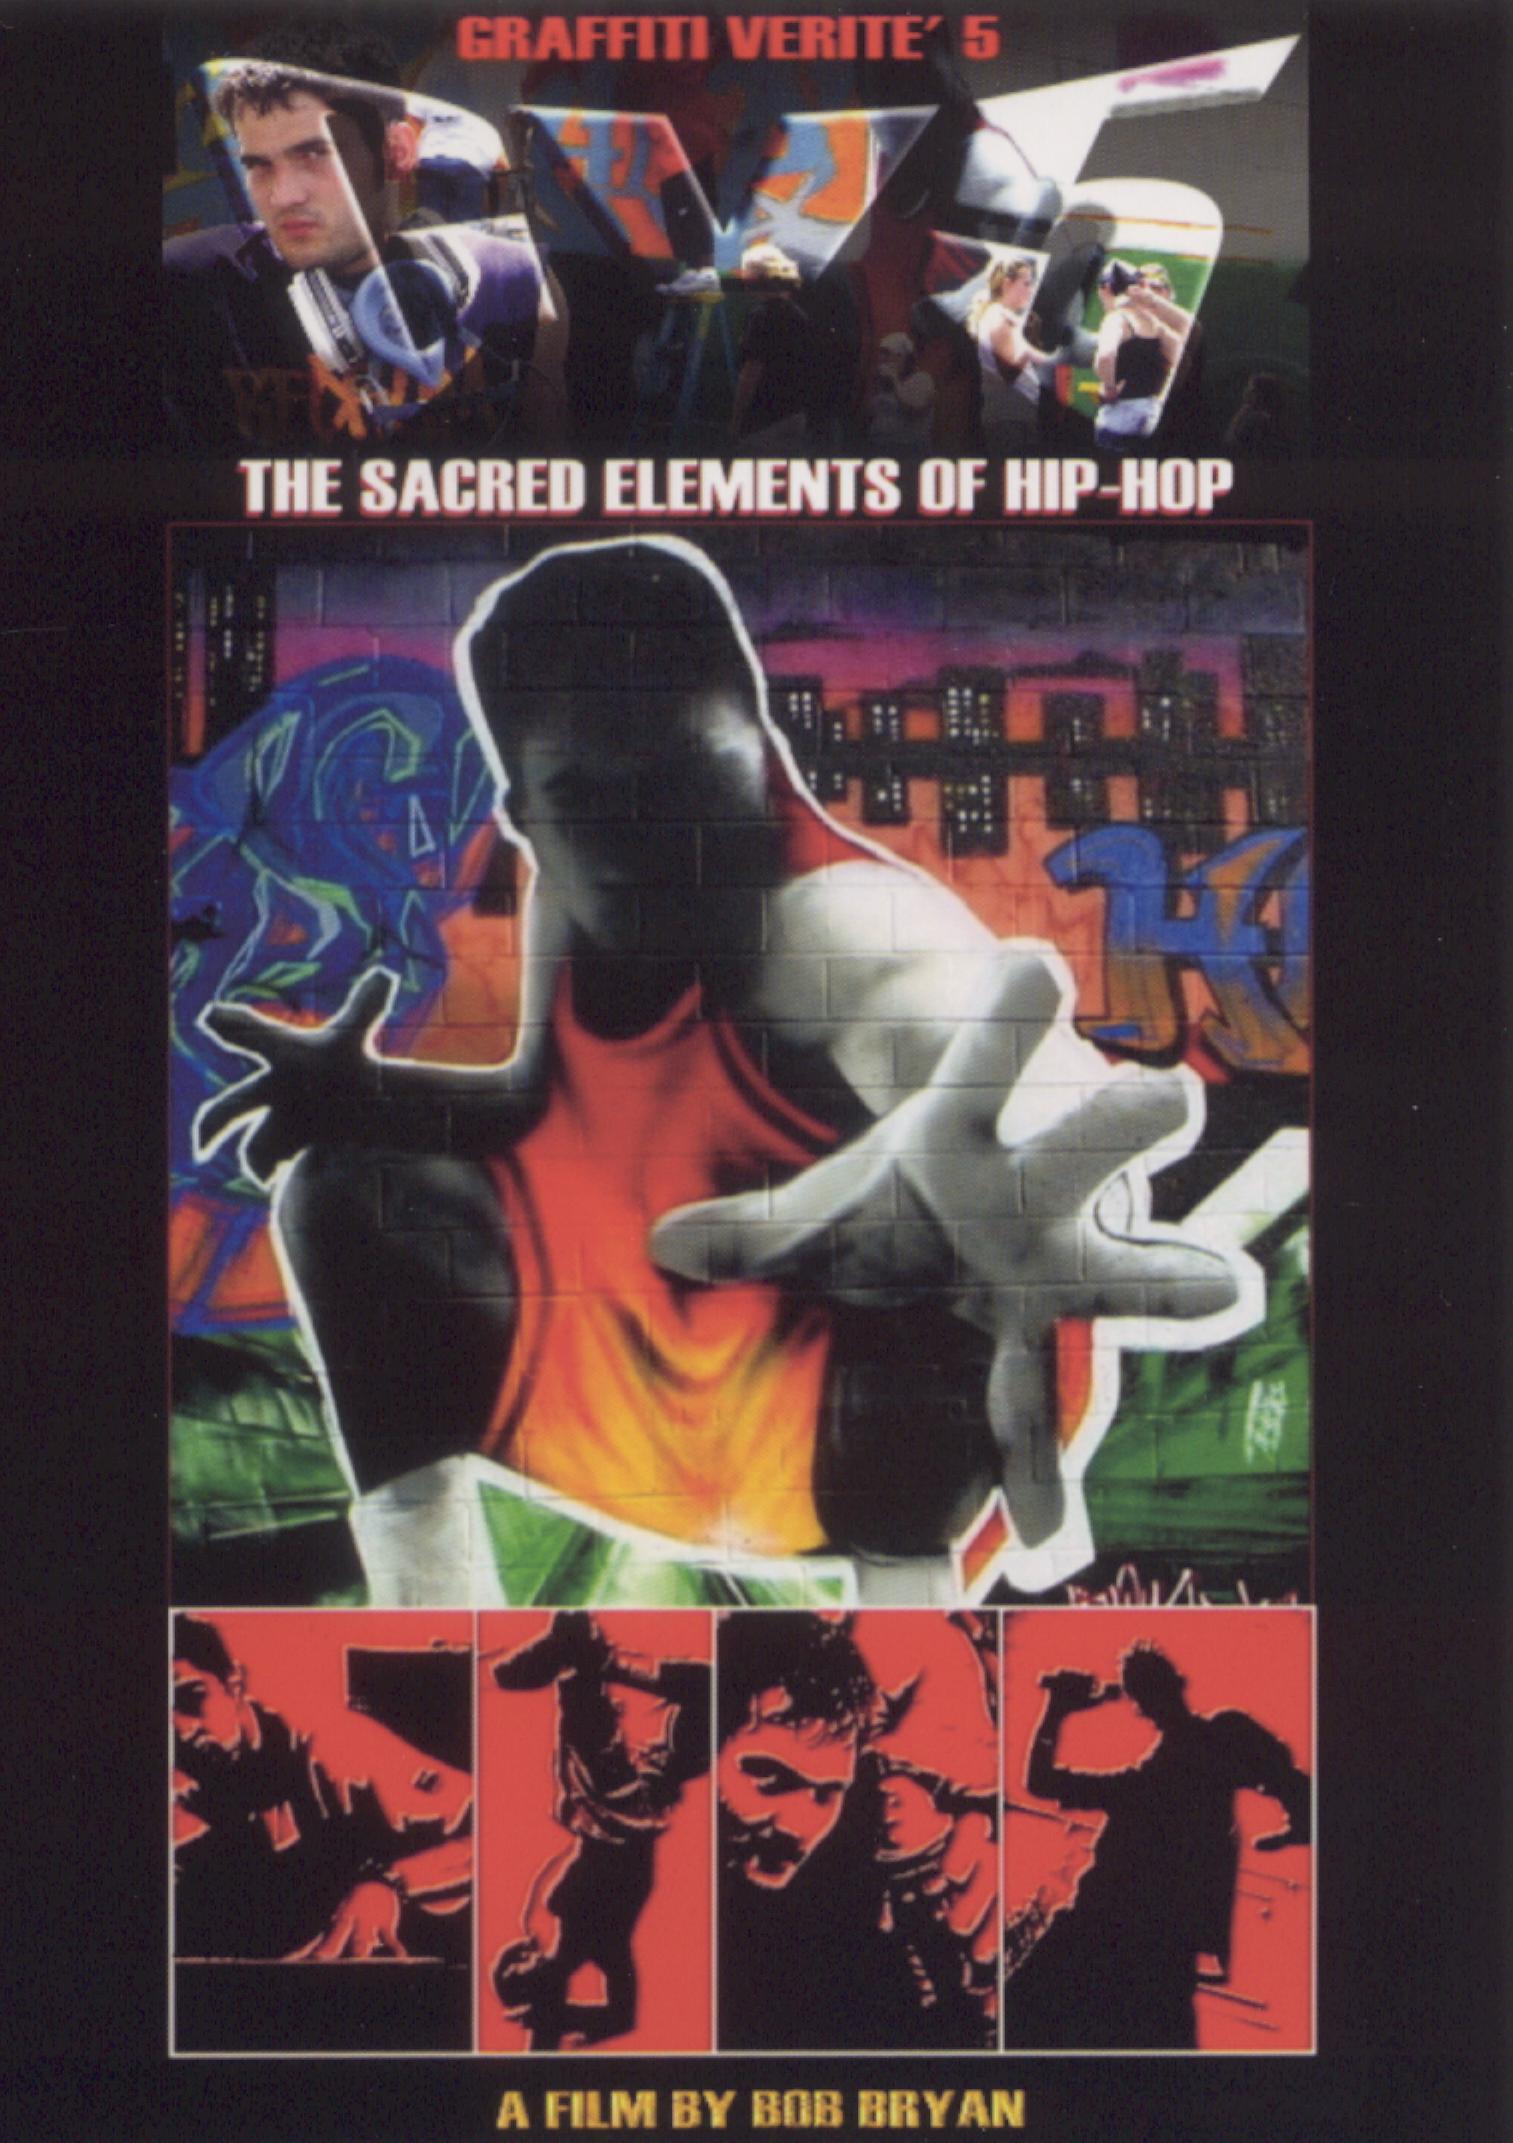 Graffiti Verite, Vol. 5: The Sacred Elements of Hip-Hop